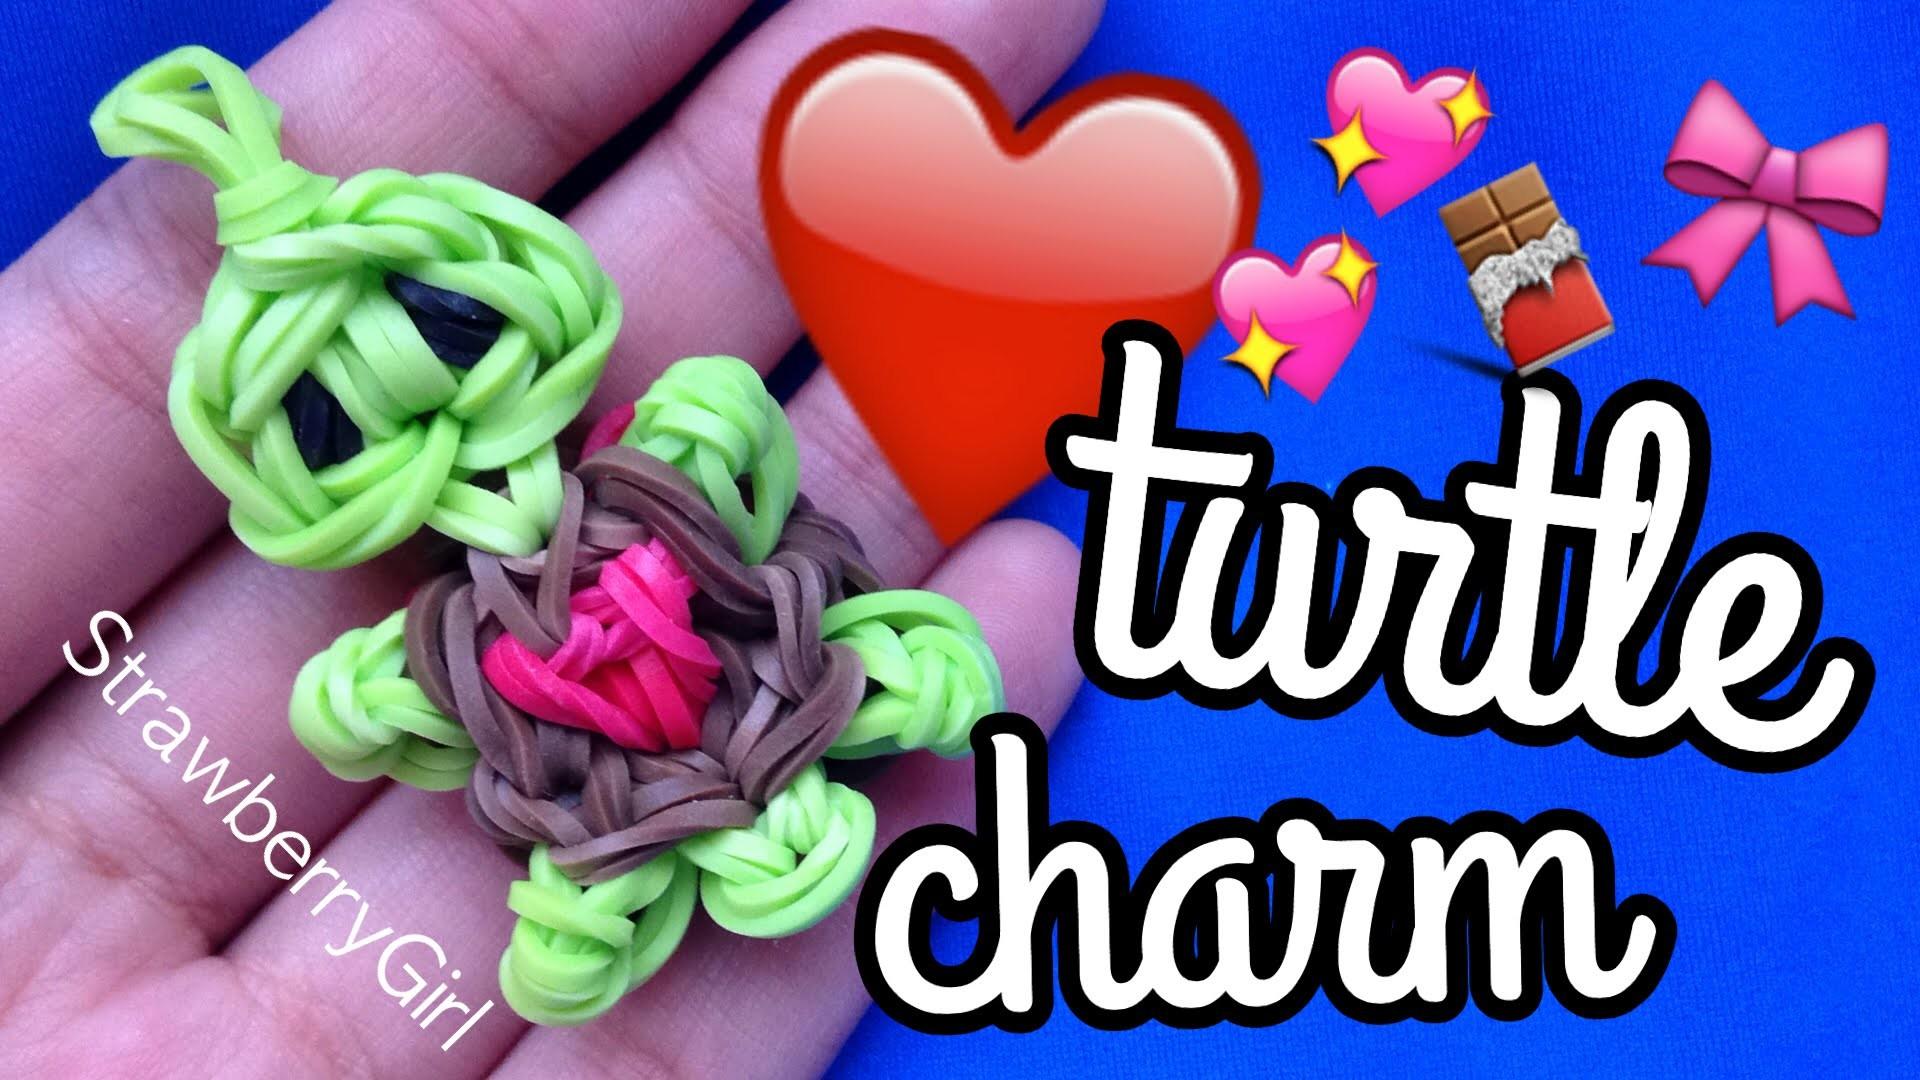 How to Make a Heart Turtle Charm - Rainbow Loom